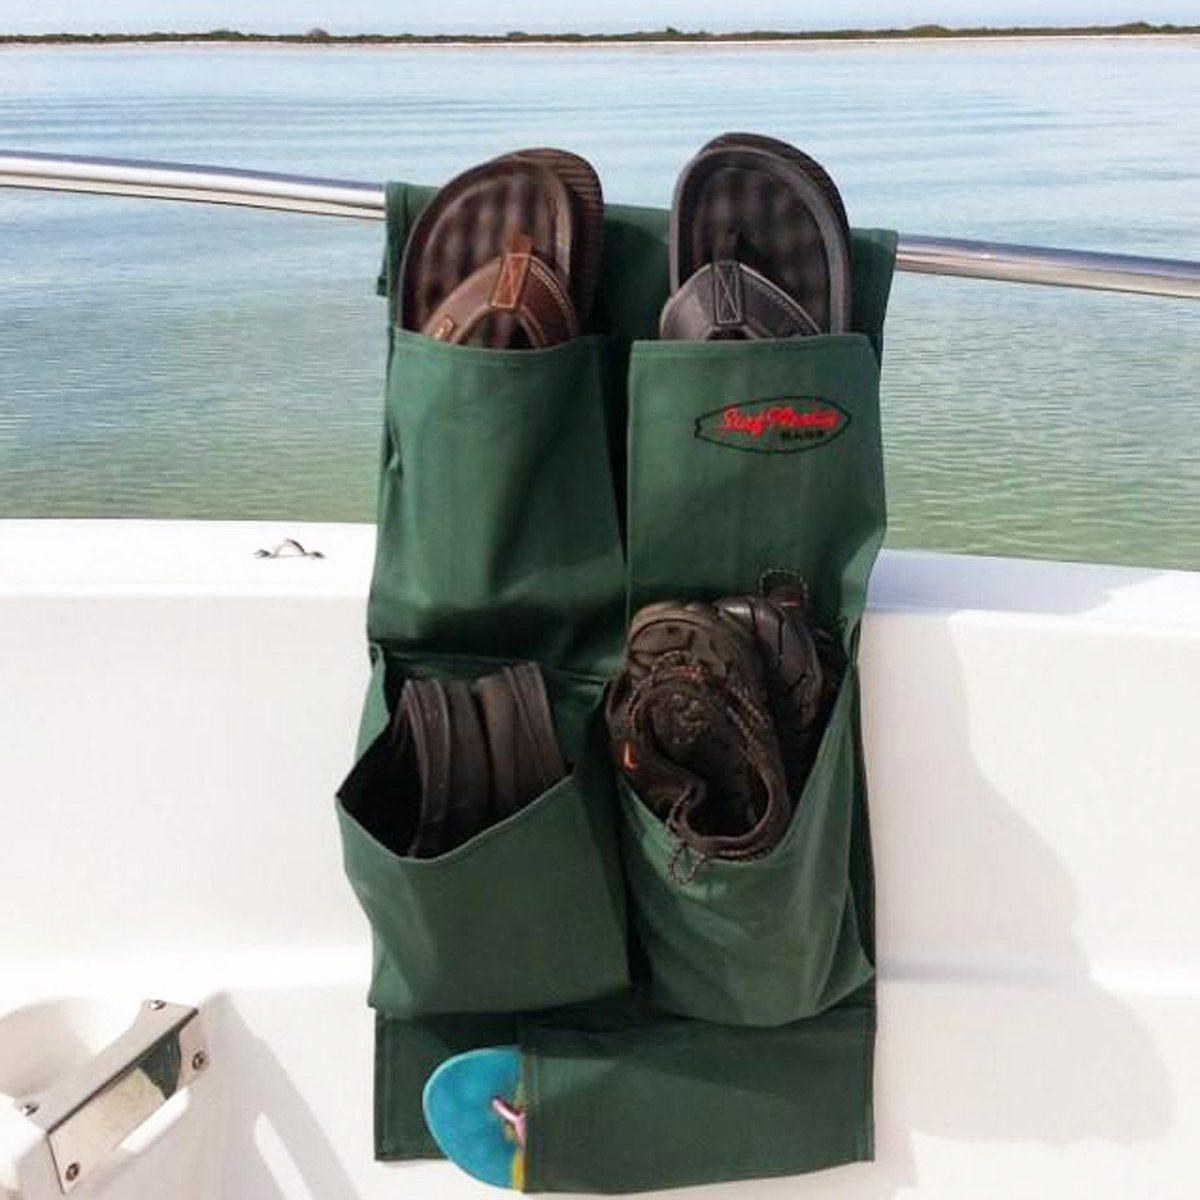 Boat shoe organizer